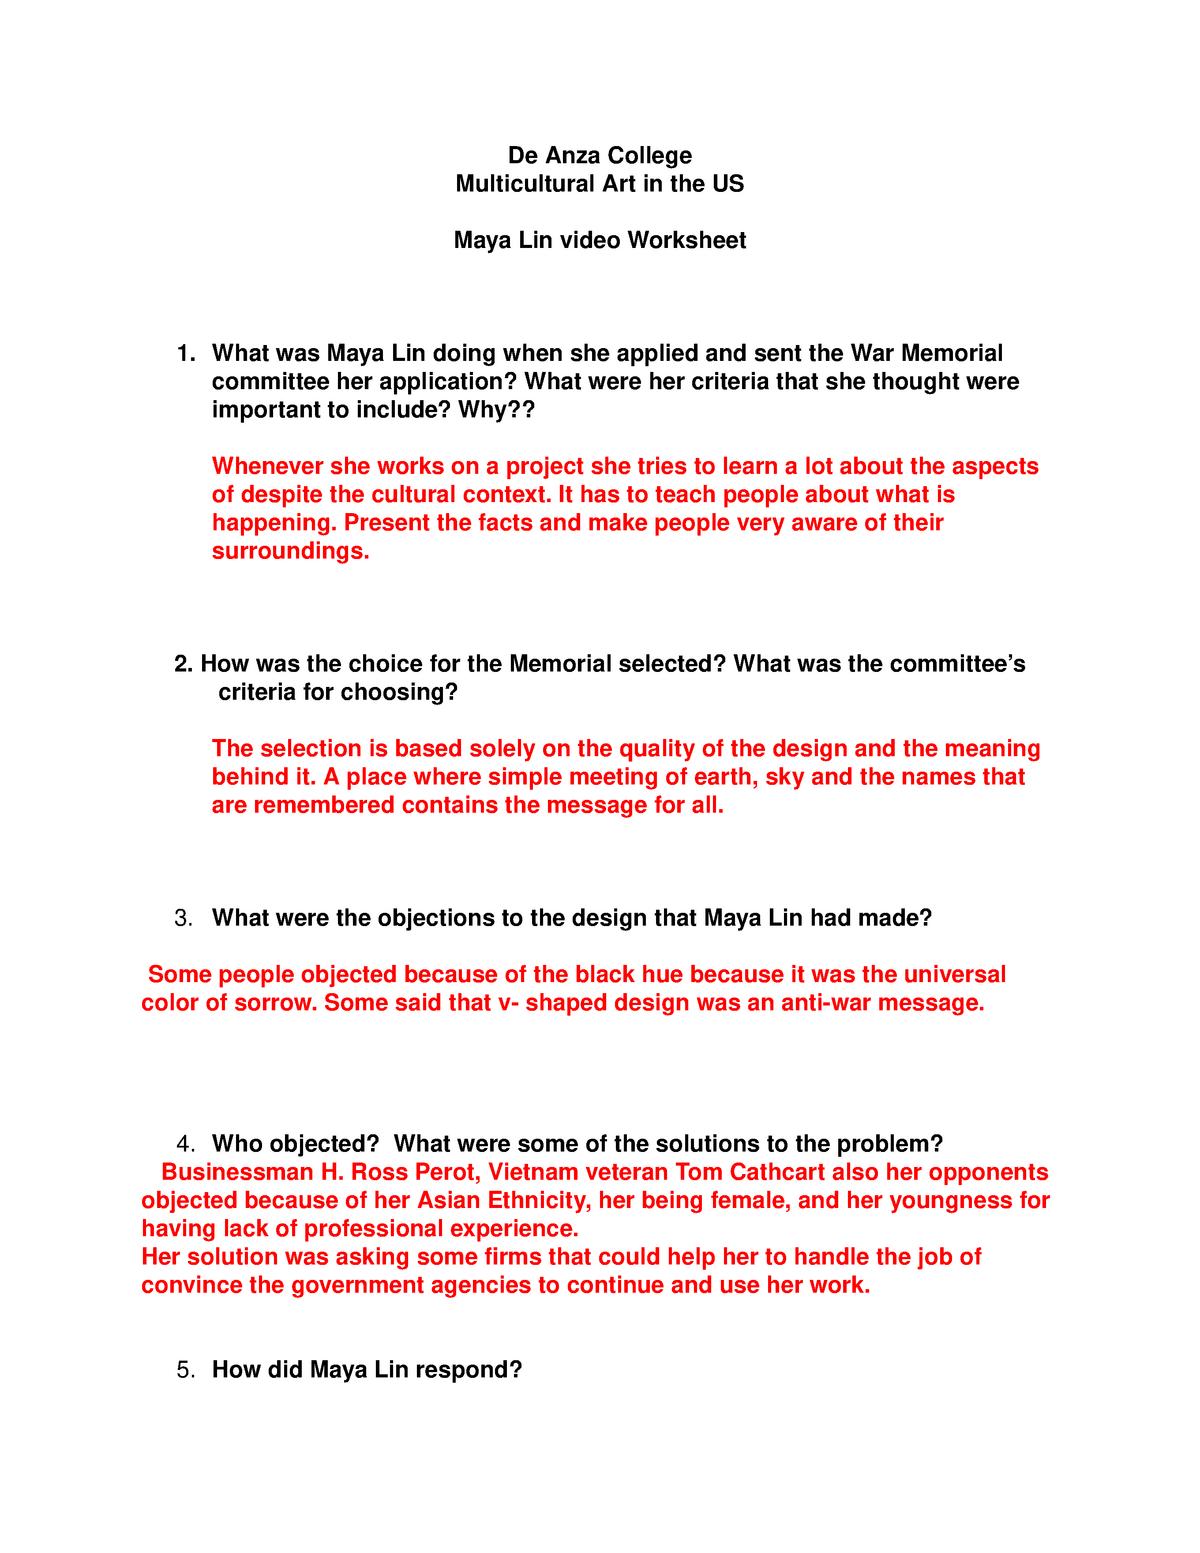 Maya Lin Video worksheet - ICS 5 - De Anza - StuDocu